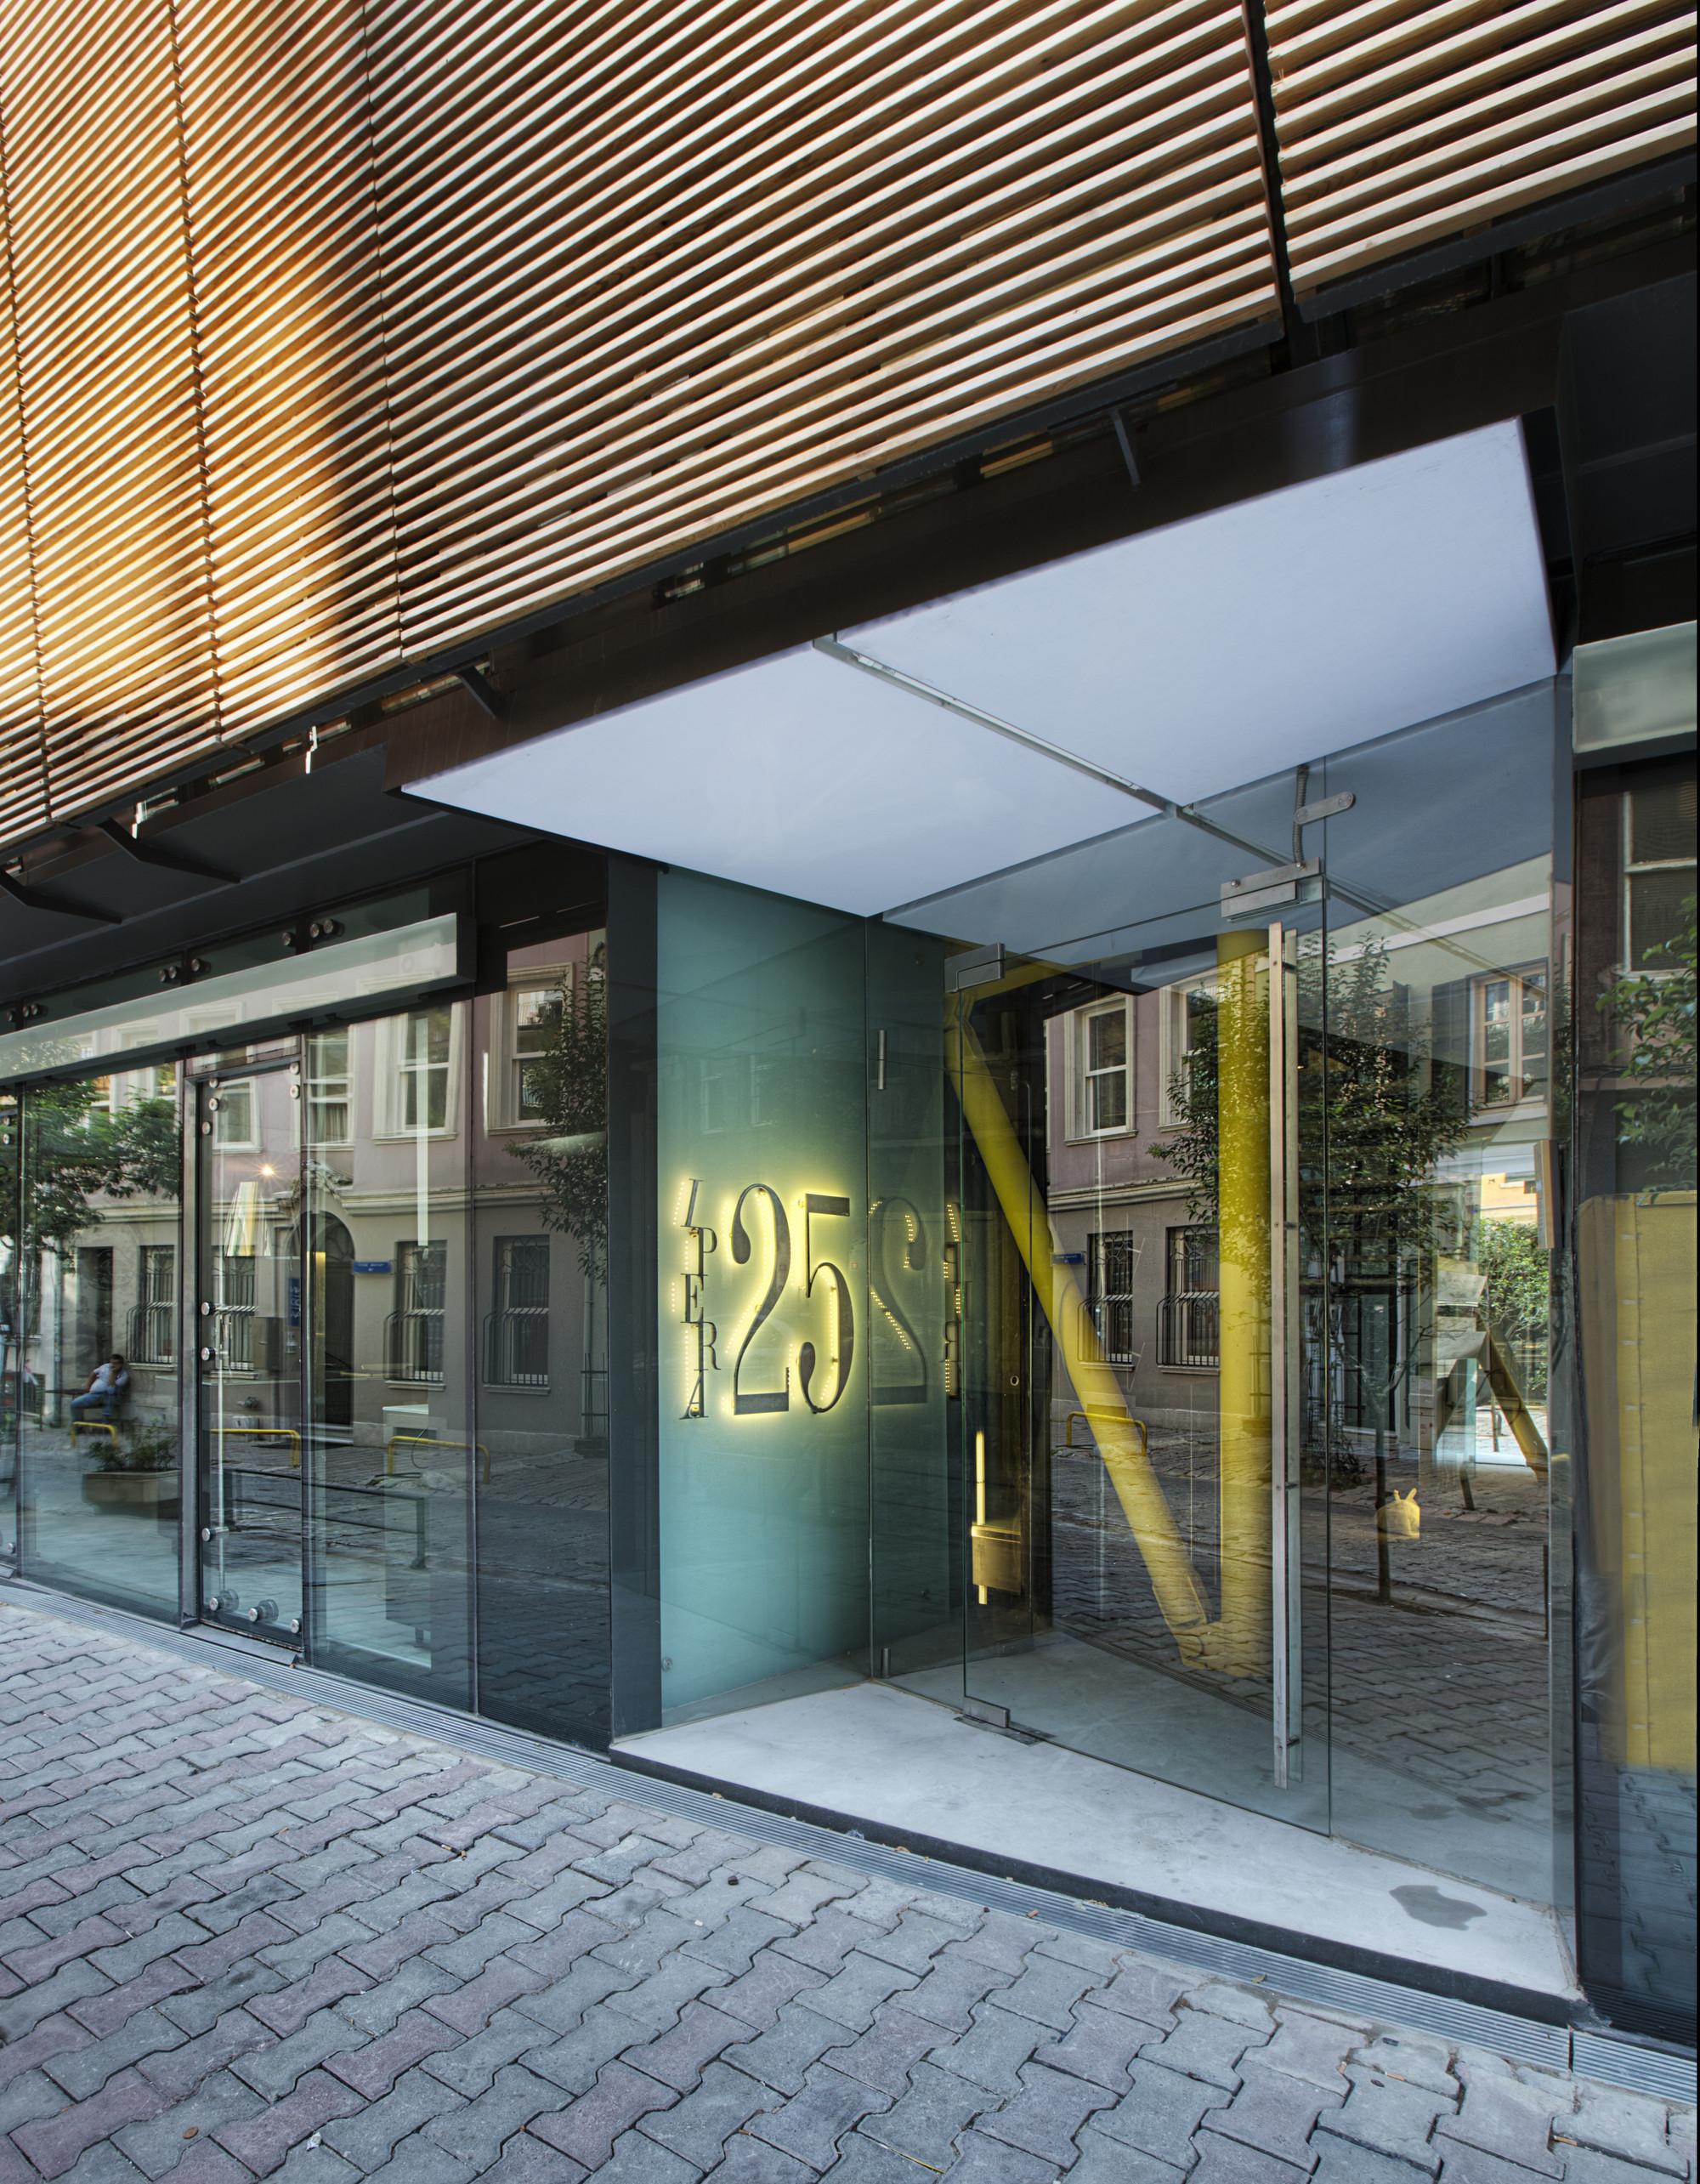 galer a de pera 25 alata architecture consulting 21. Black Bedroom Furniture Sets. Home Design Ideas